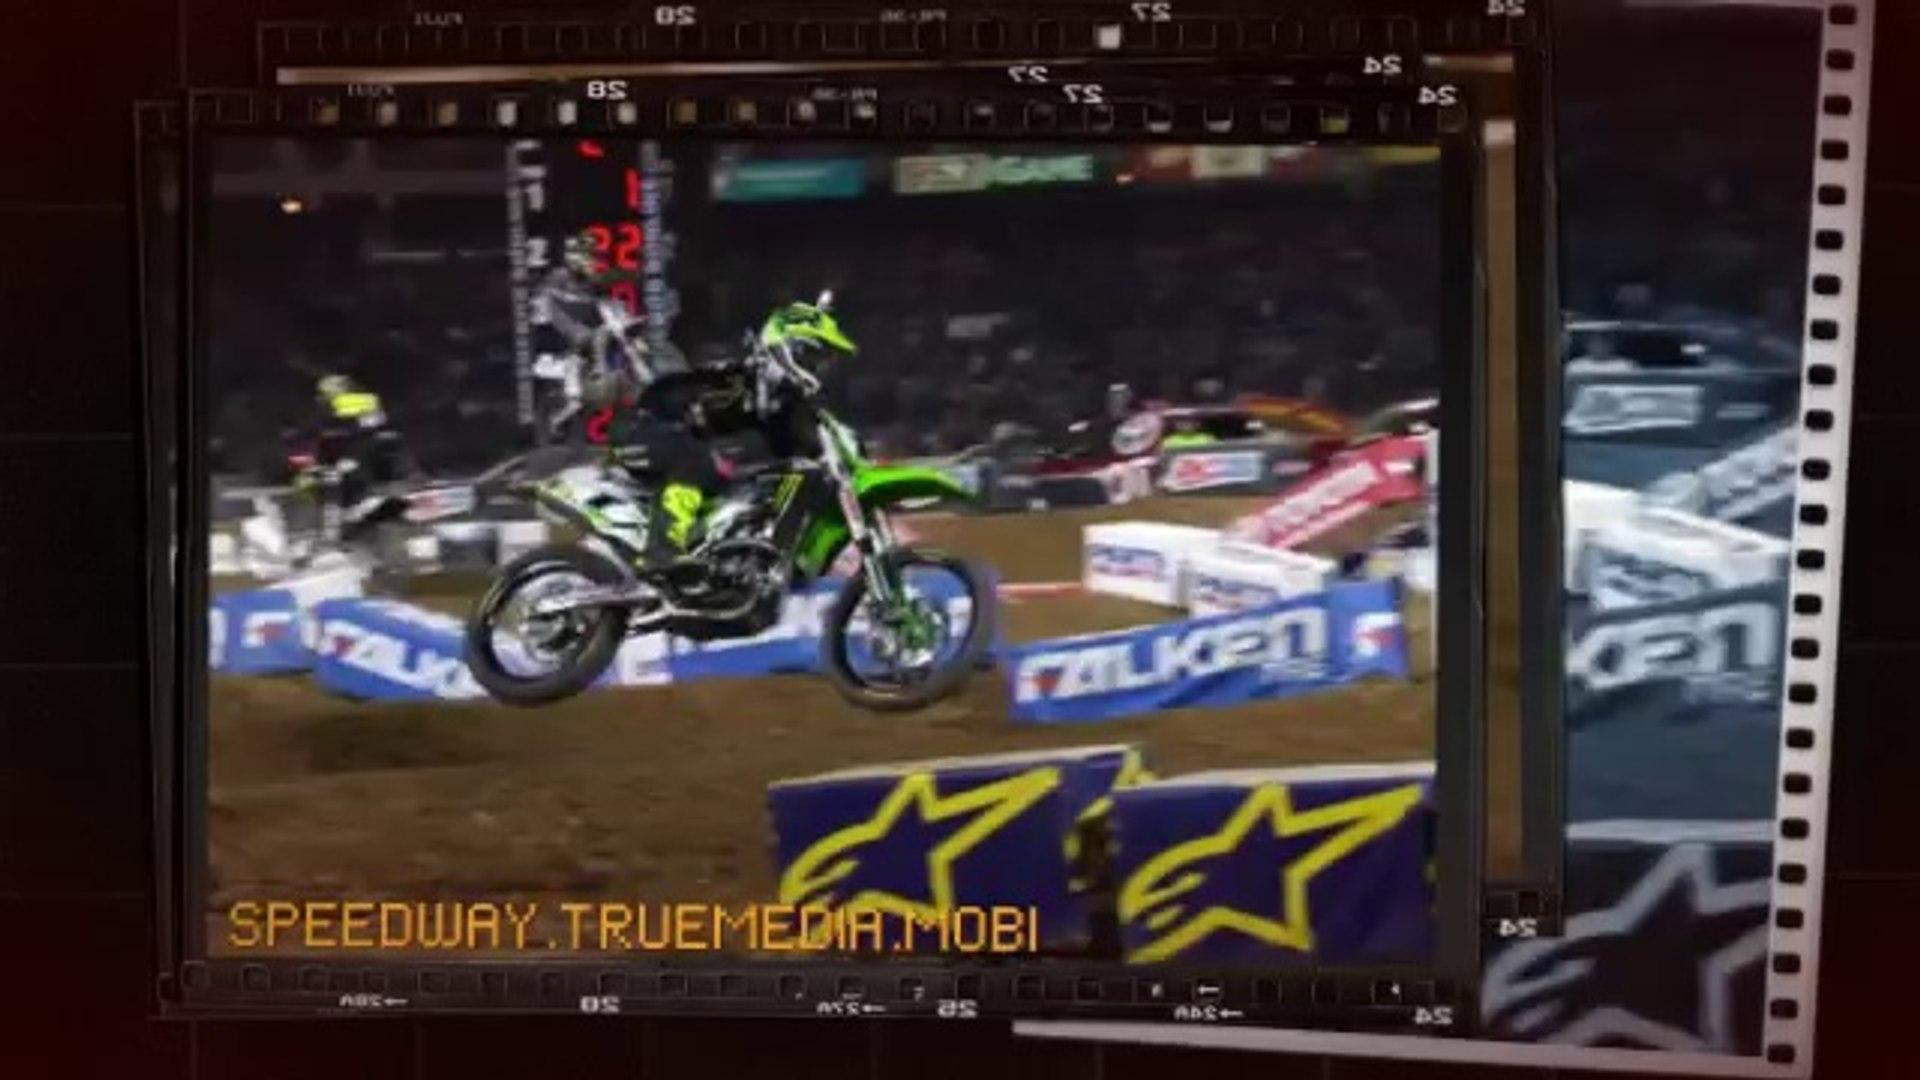 Watch supercross 2014 result - live Supercross - supercross events 2014 - supercross ama 2014 -